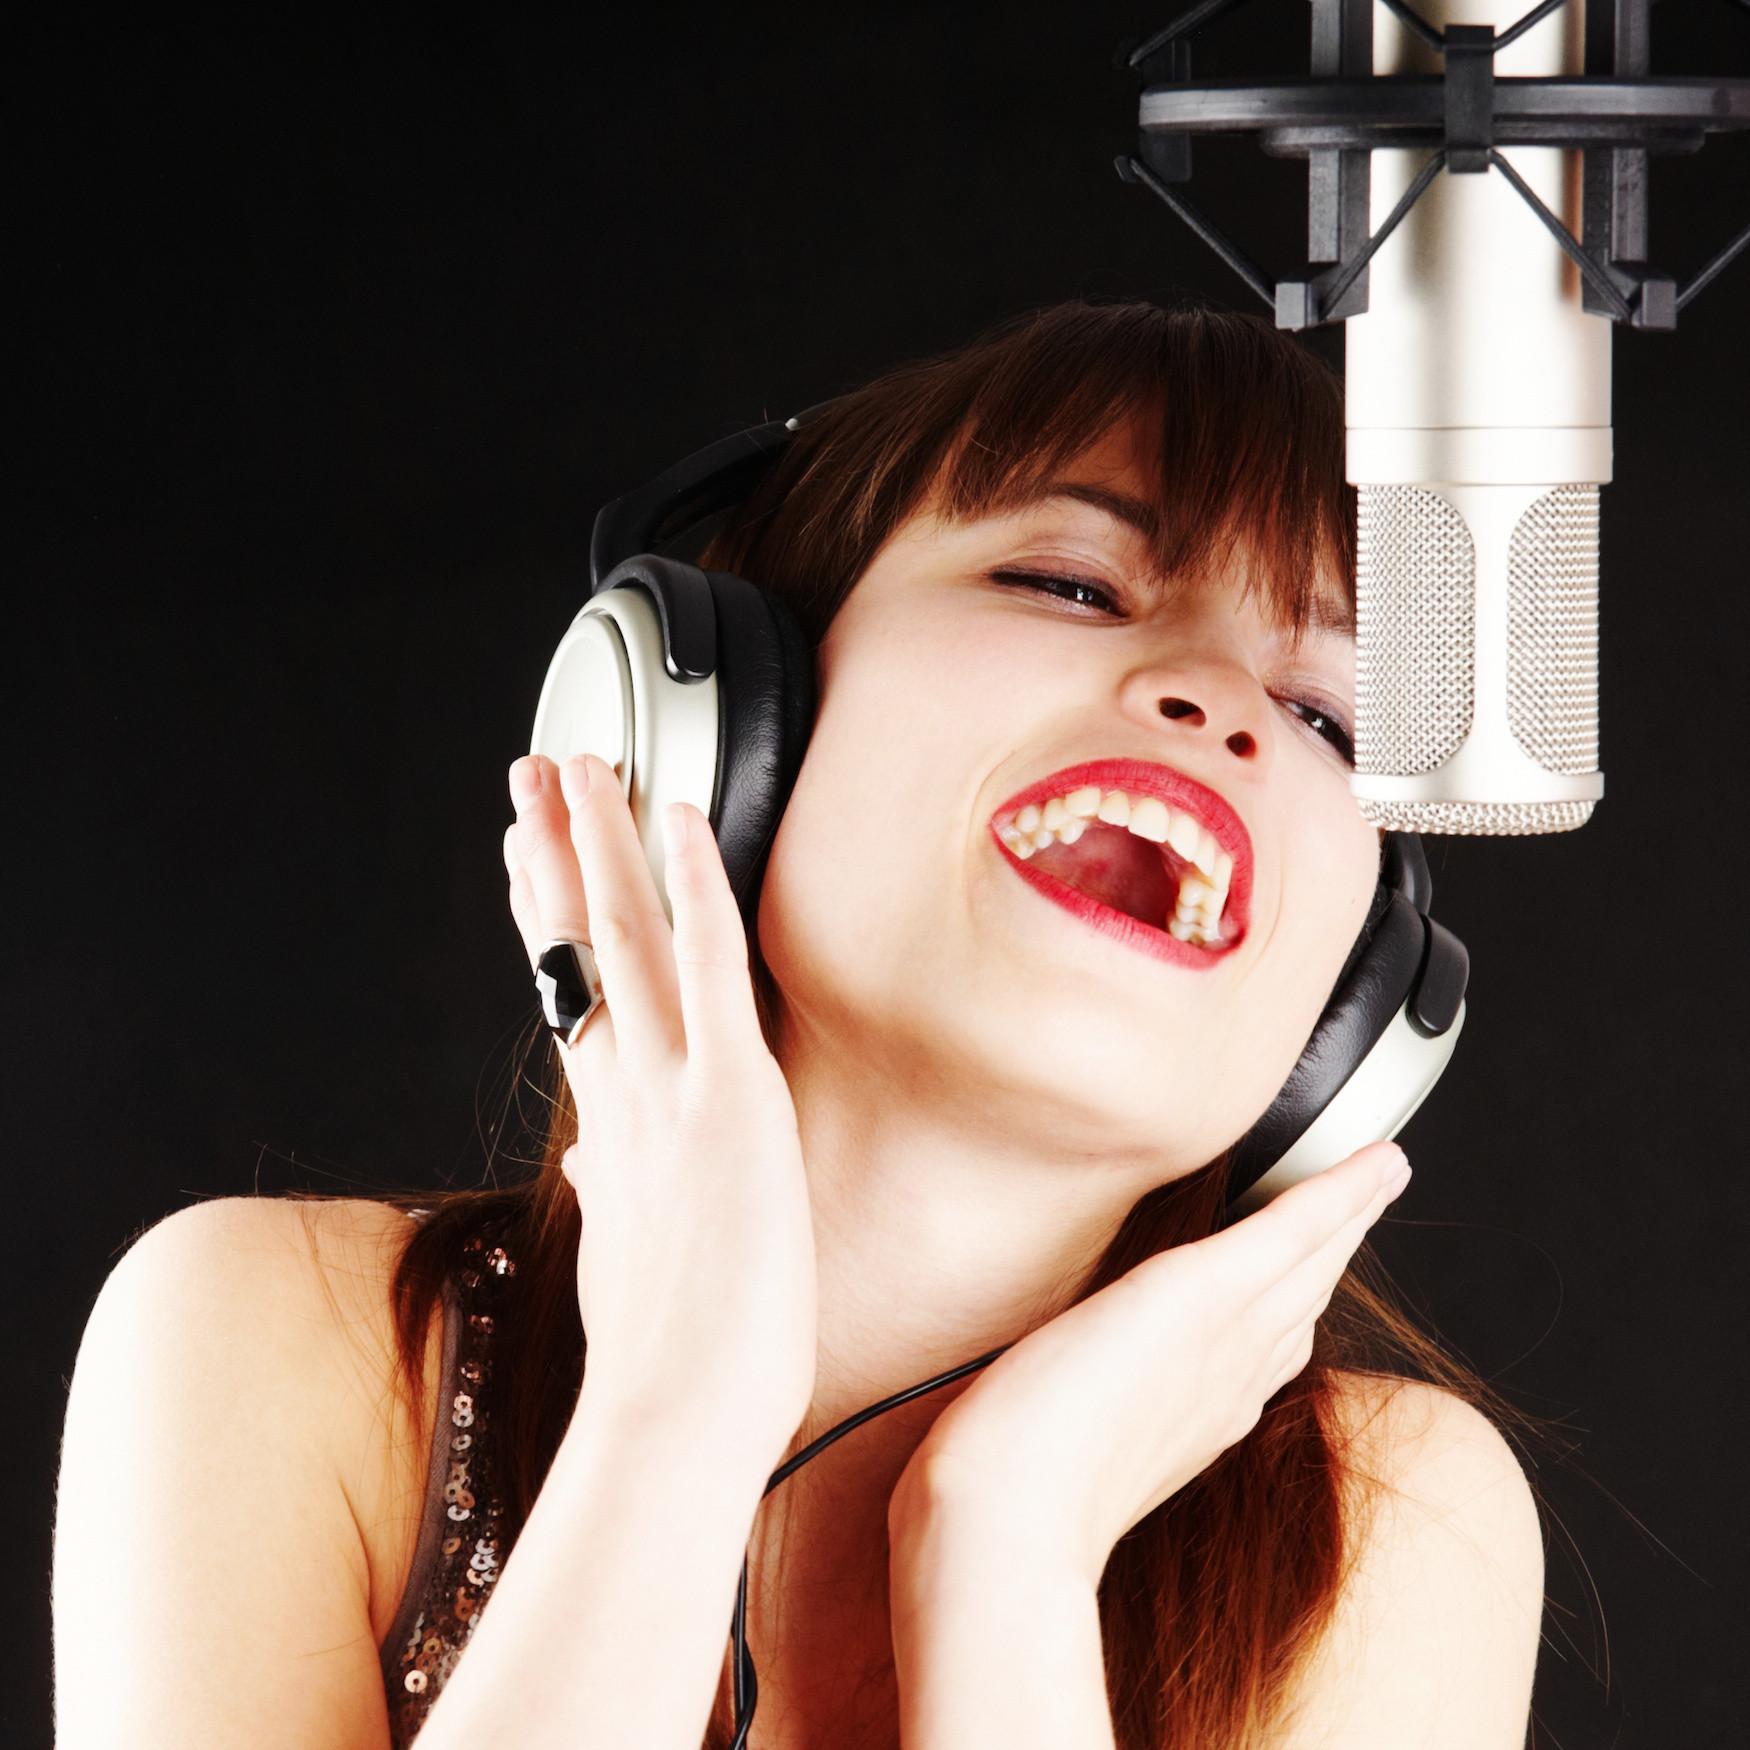 2hr Vocalist Gift Experience